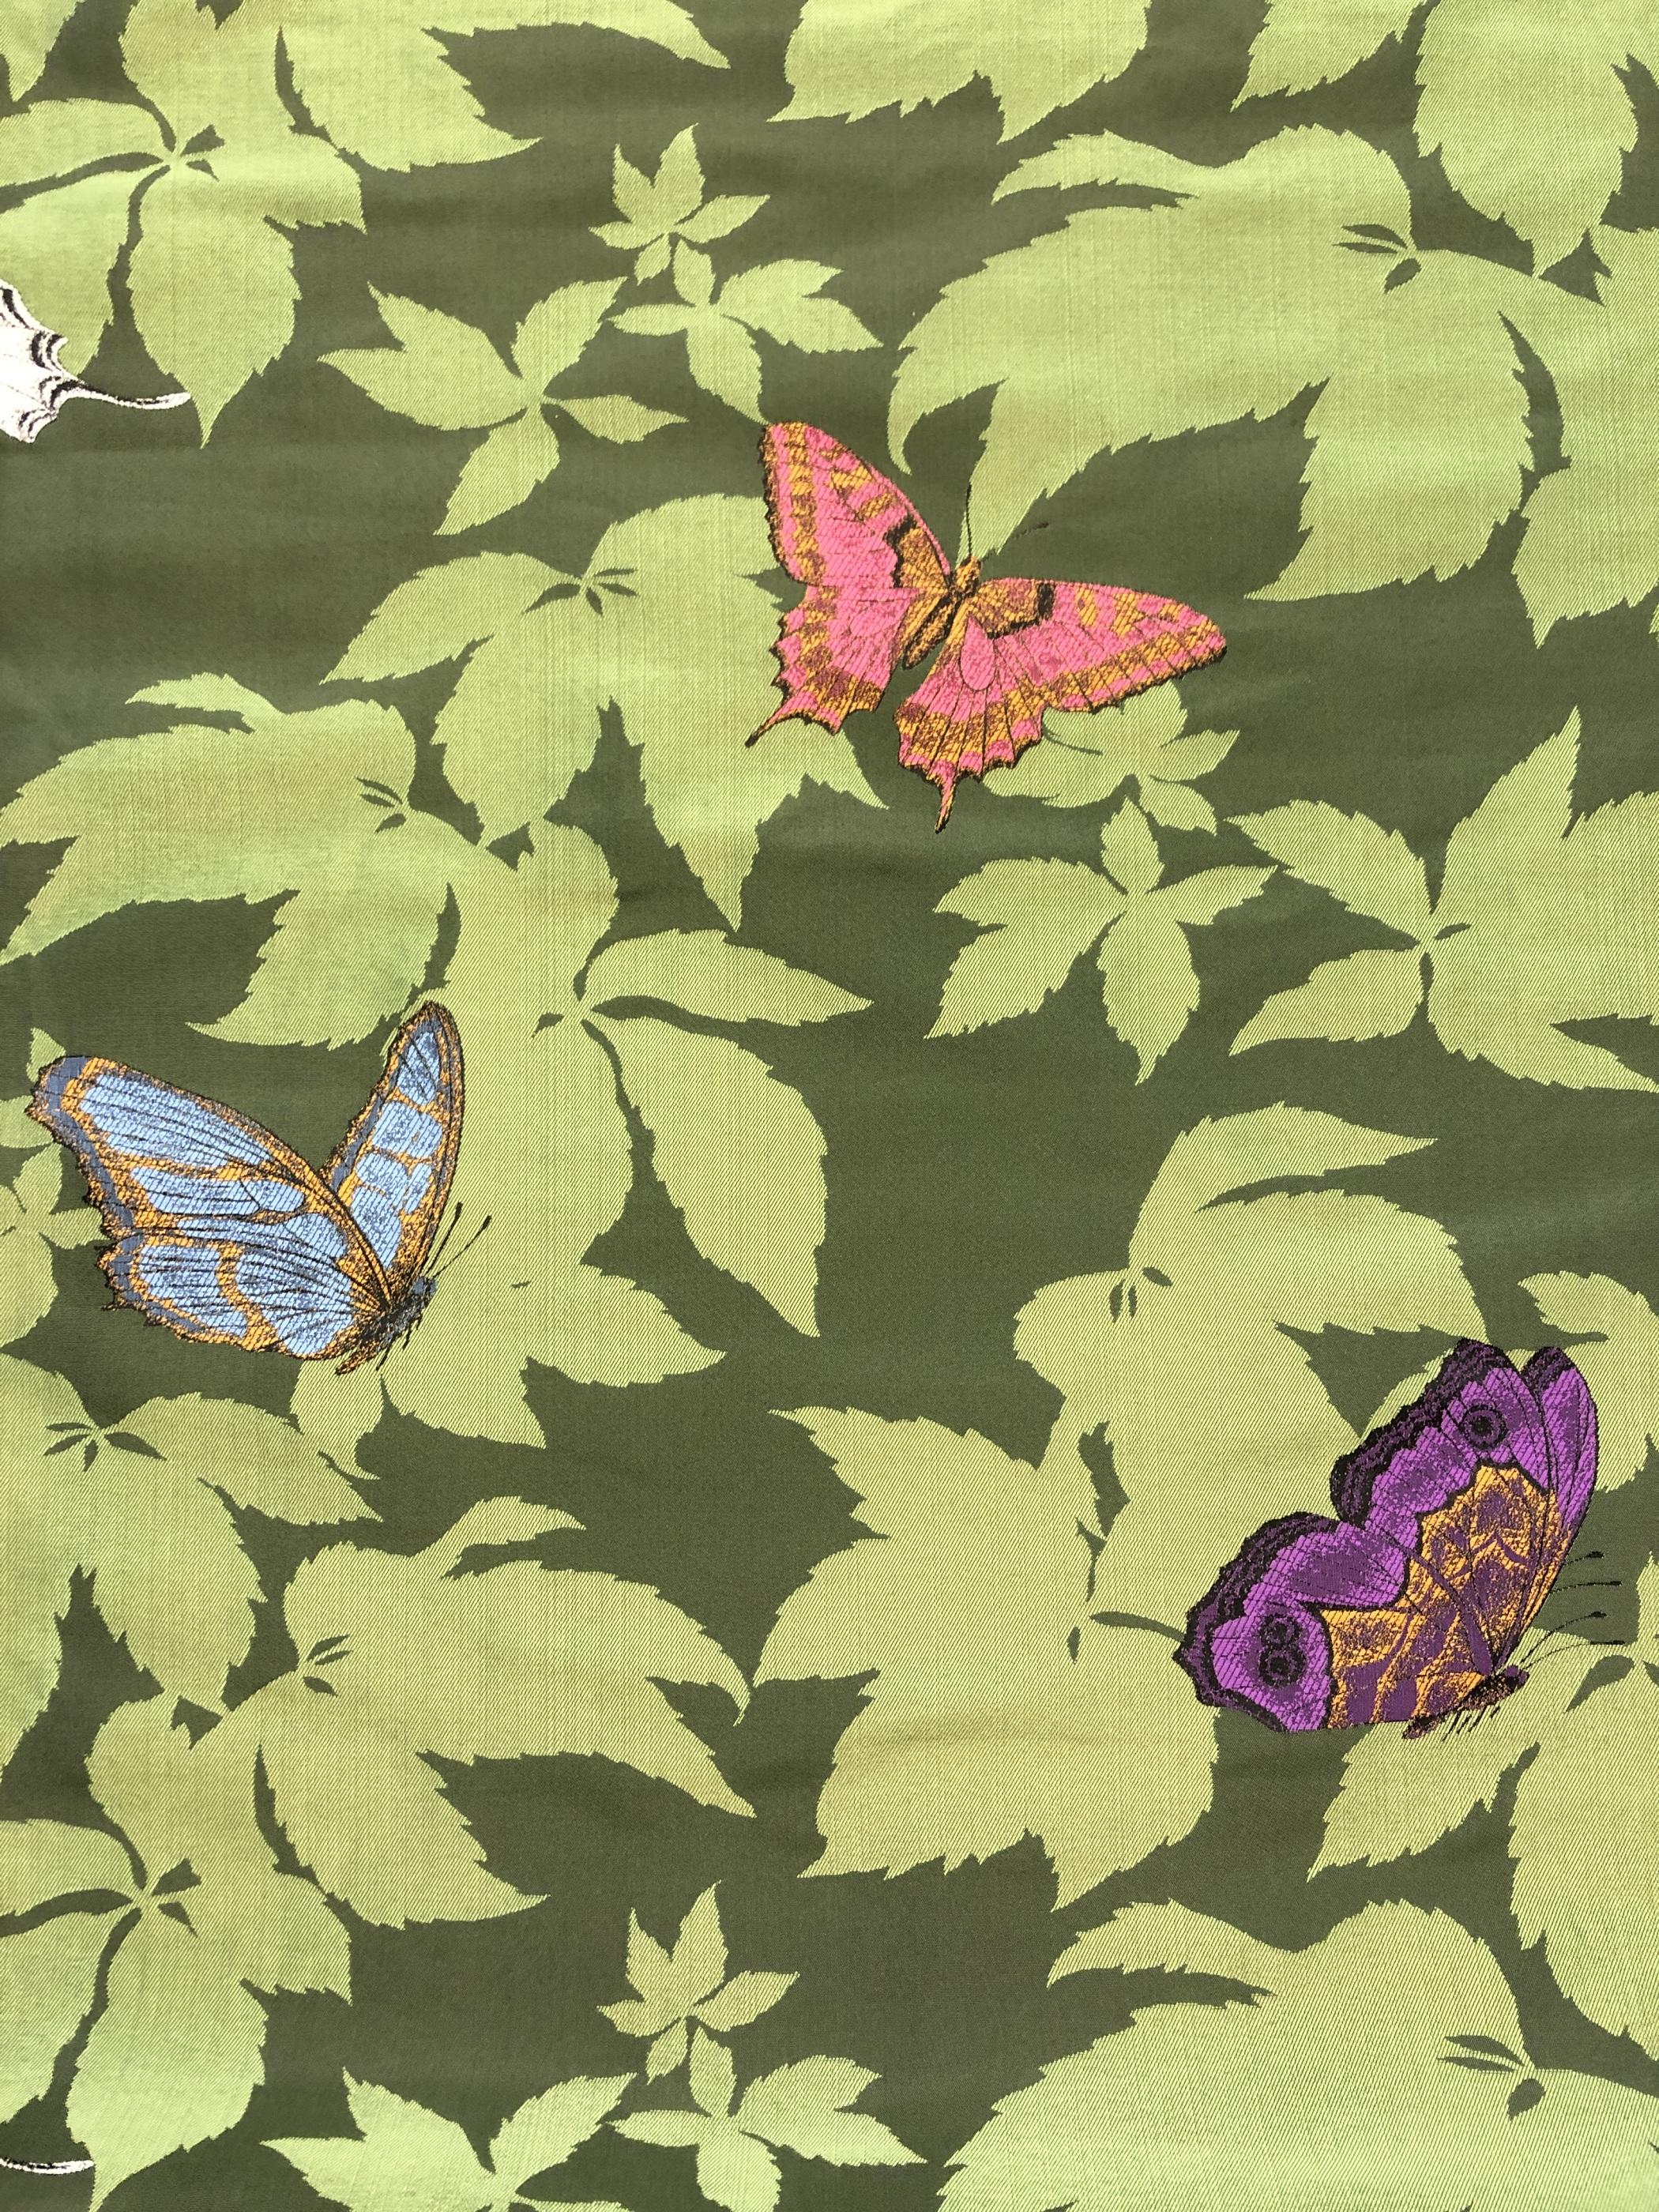 fjärilsträdgård fjäril jaquardväv metervara hemtextil modetyg tyglust laholm grön